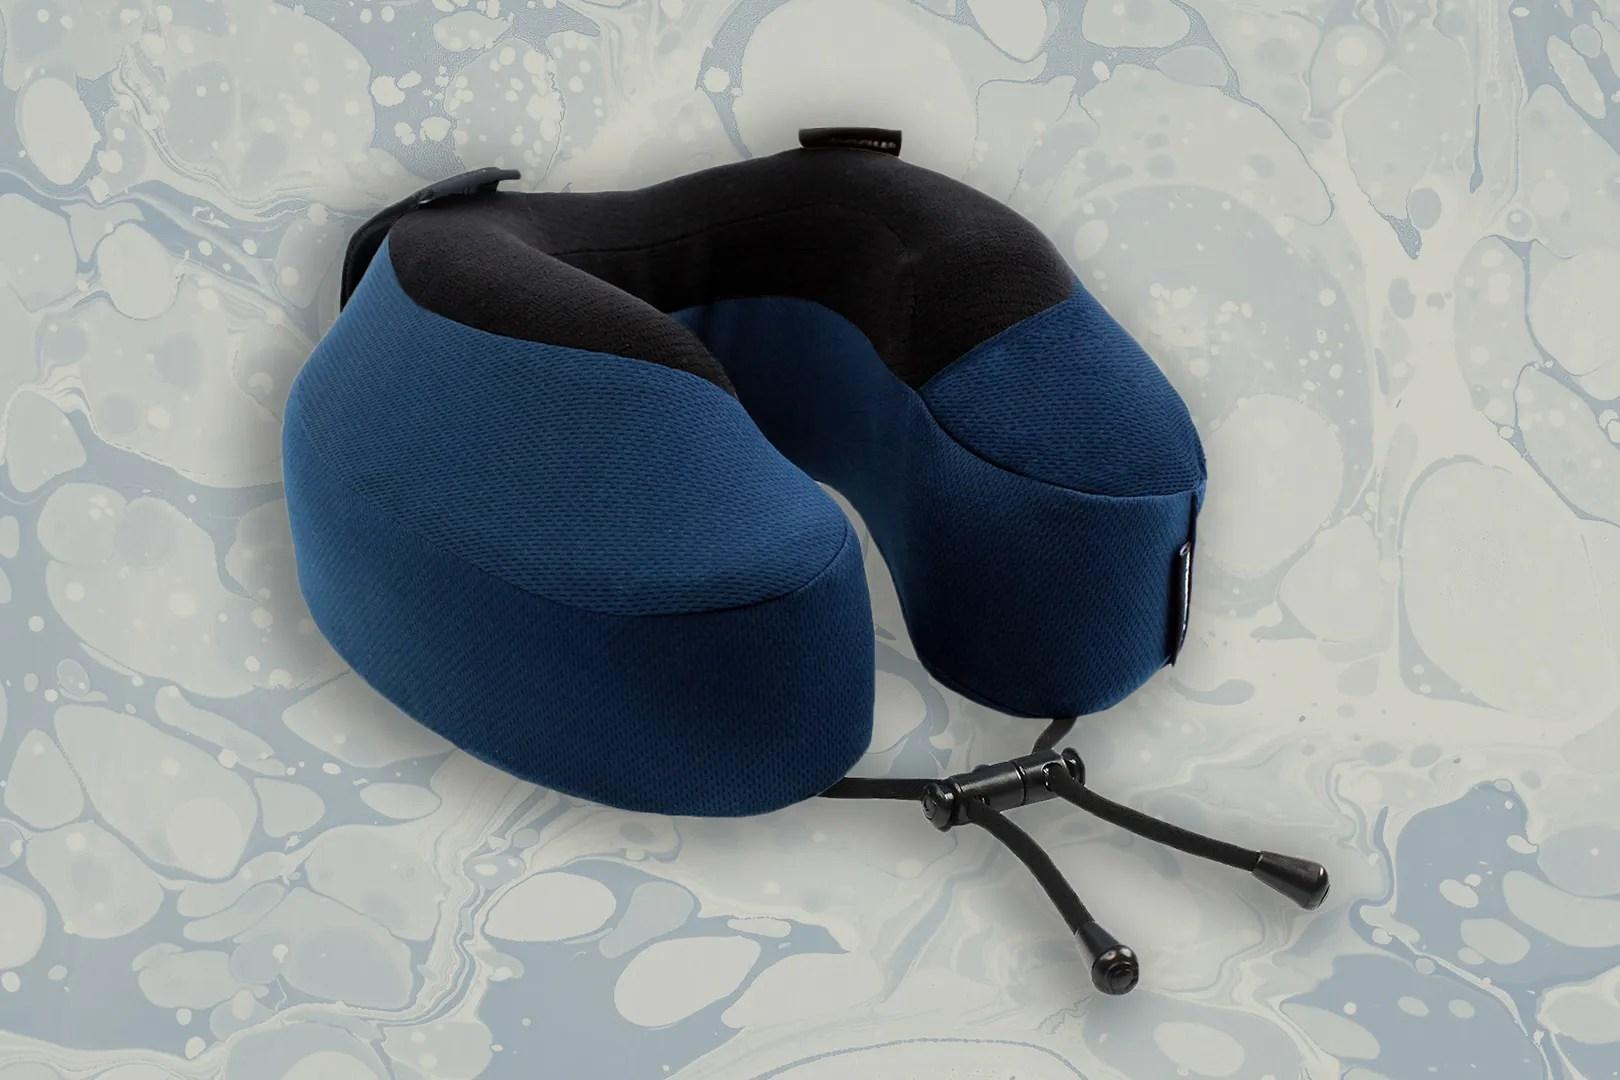 travel pillows to help you sleep